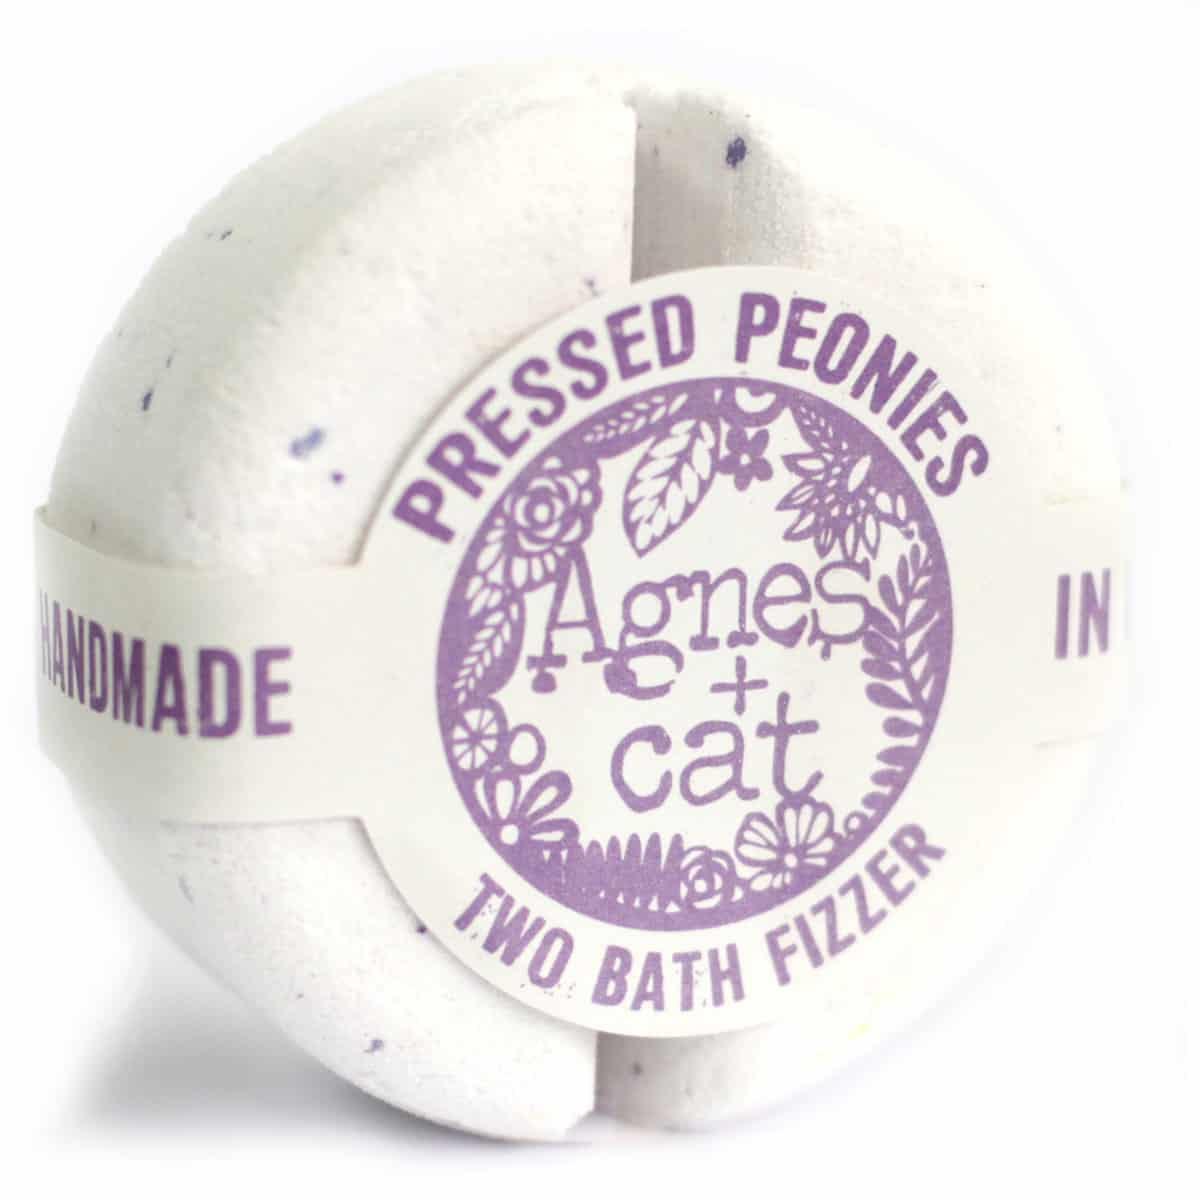 pressed peonies bath bomb by agnes & cat